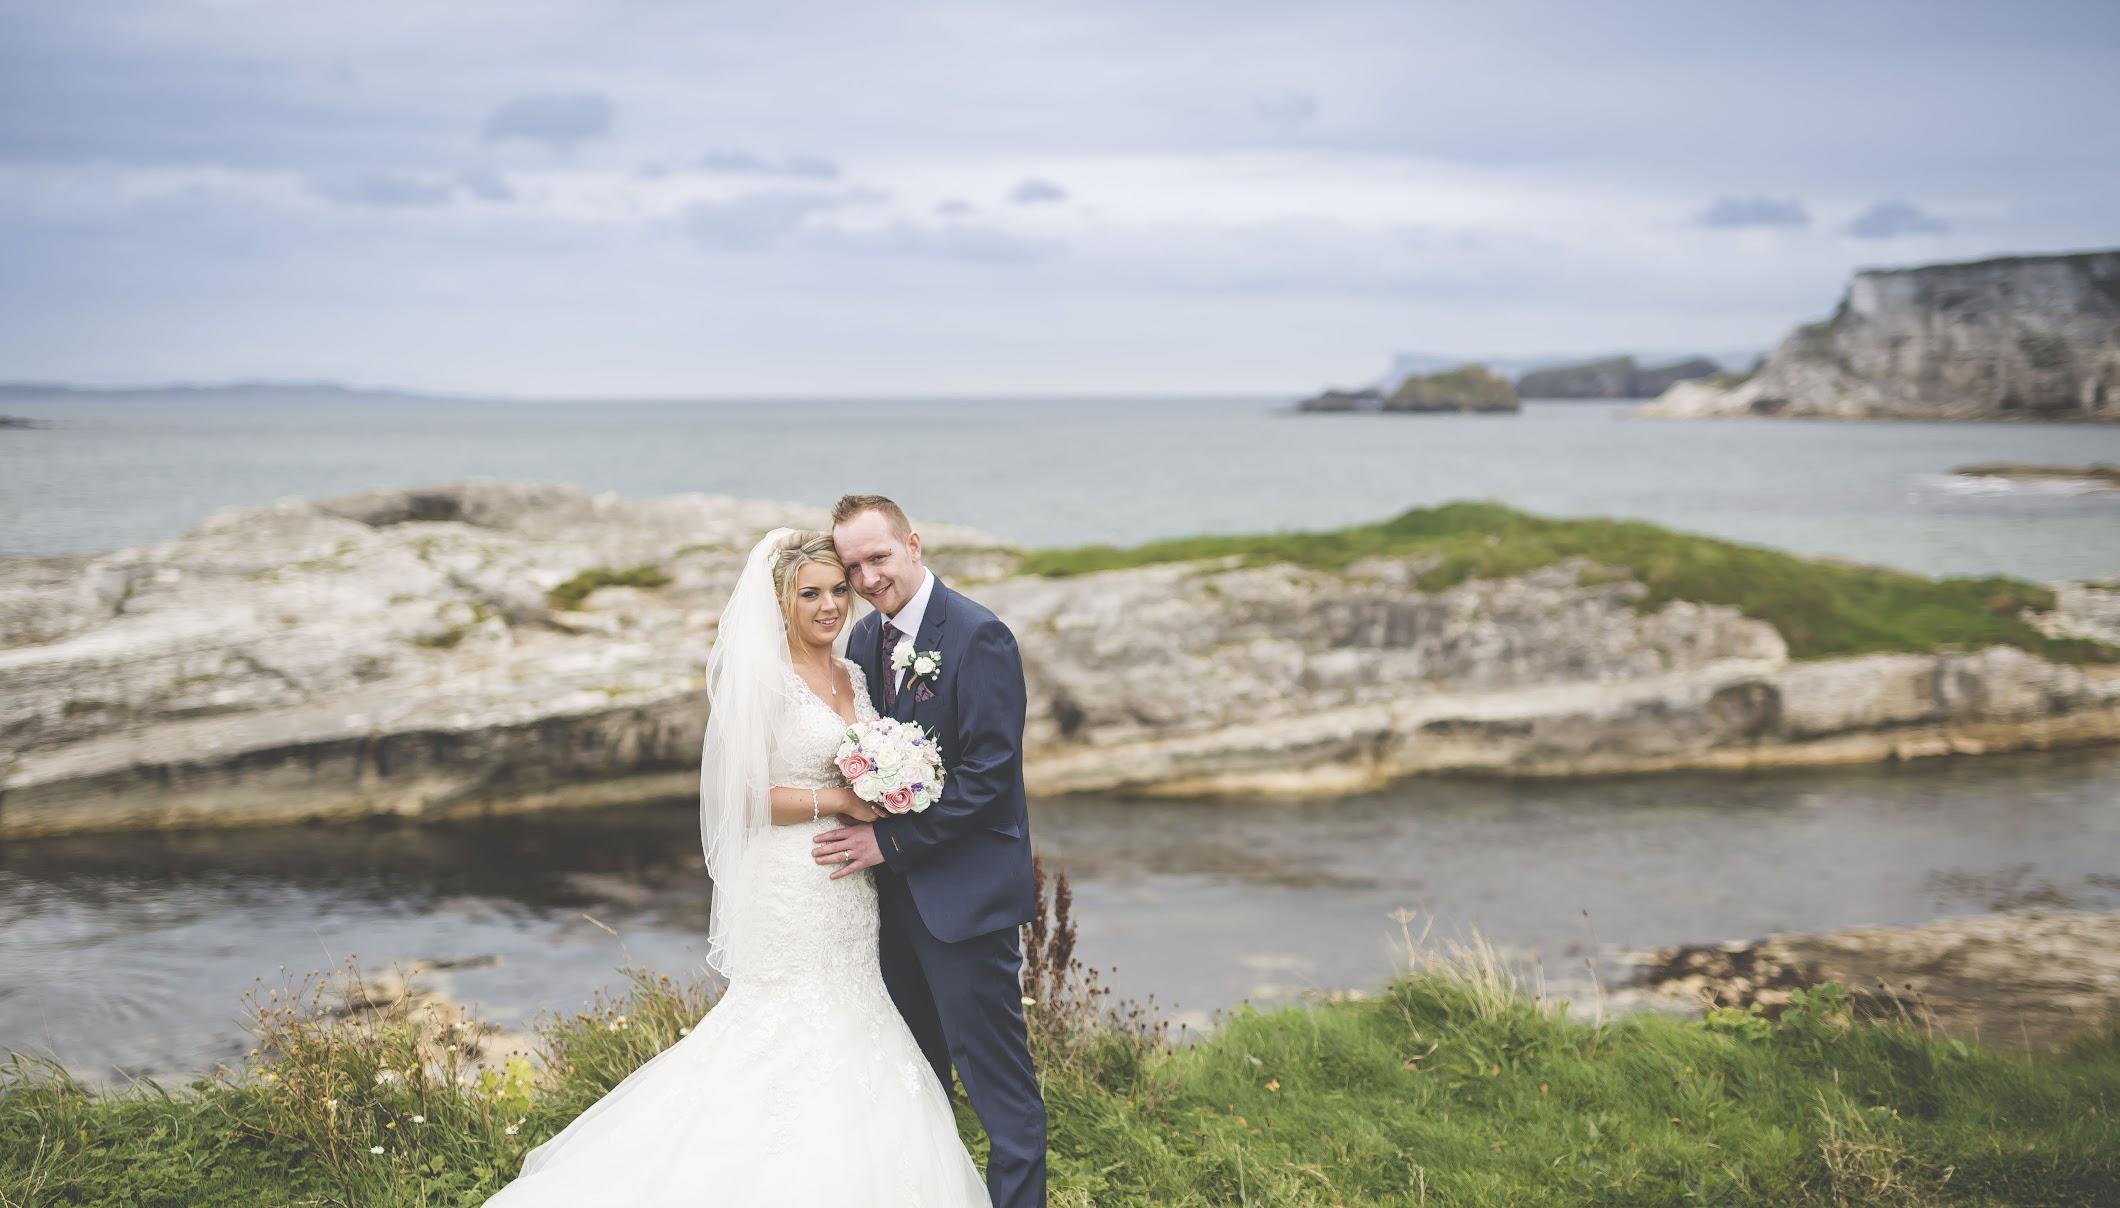 QML Videos - Weddings